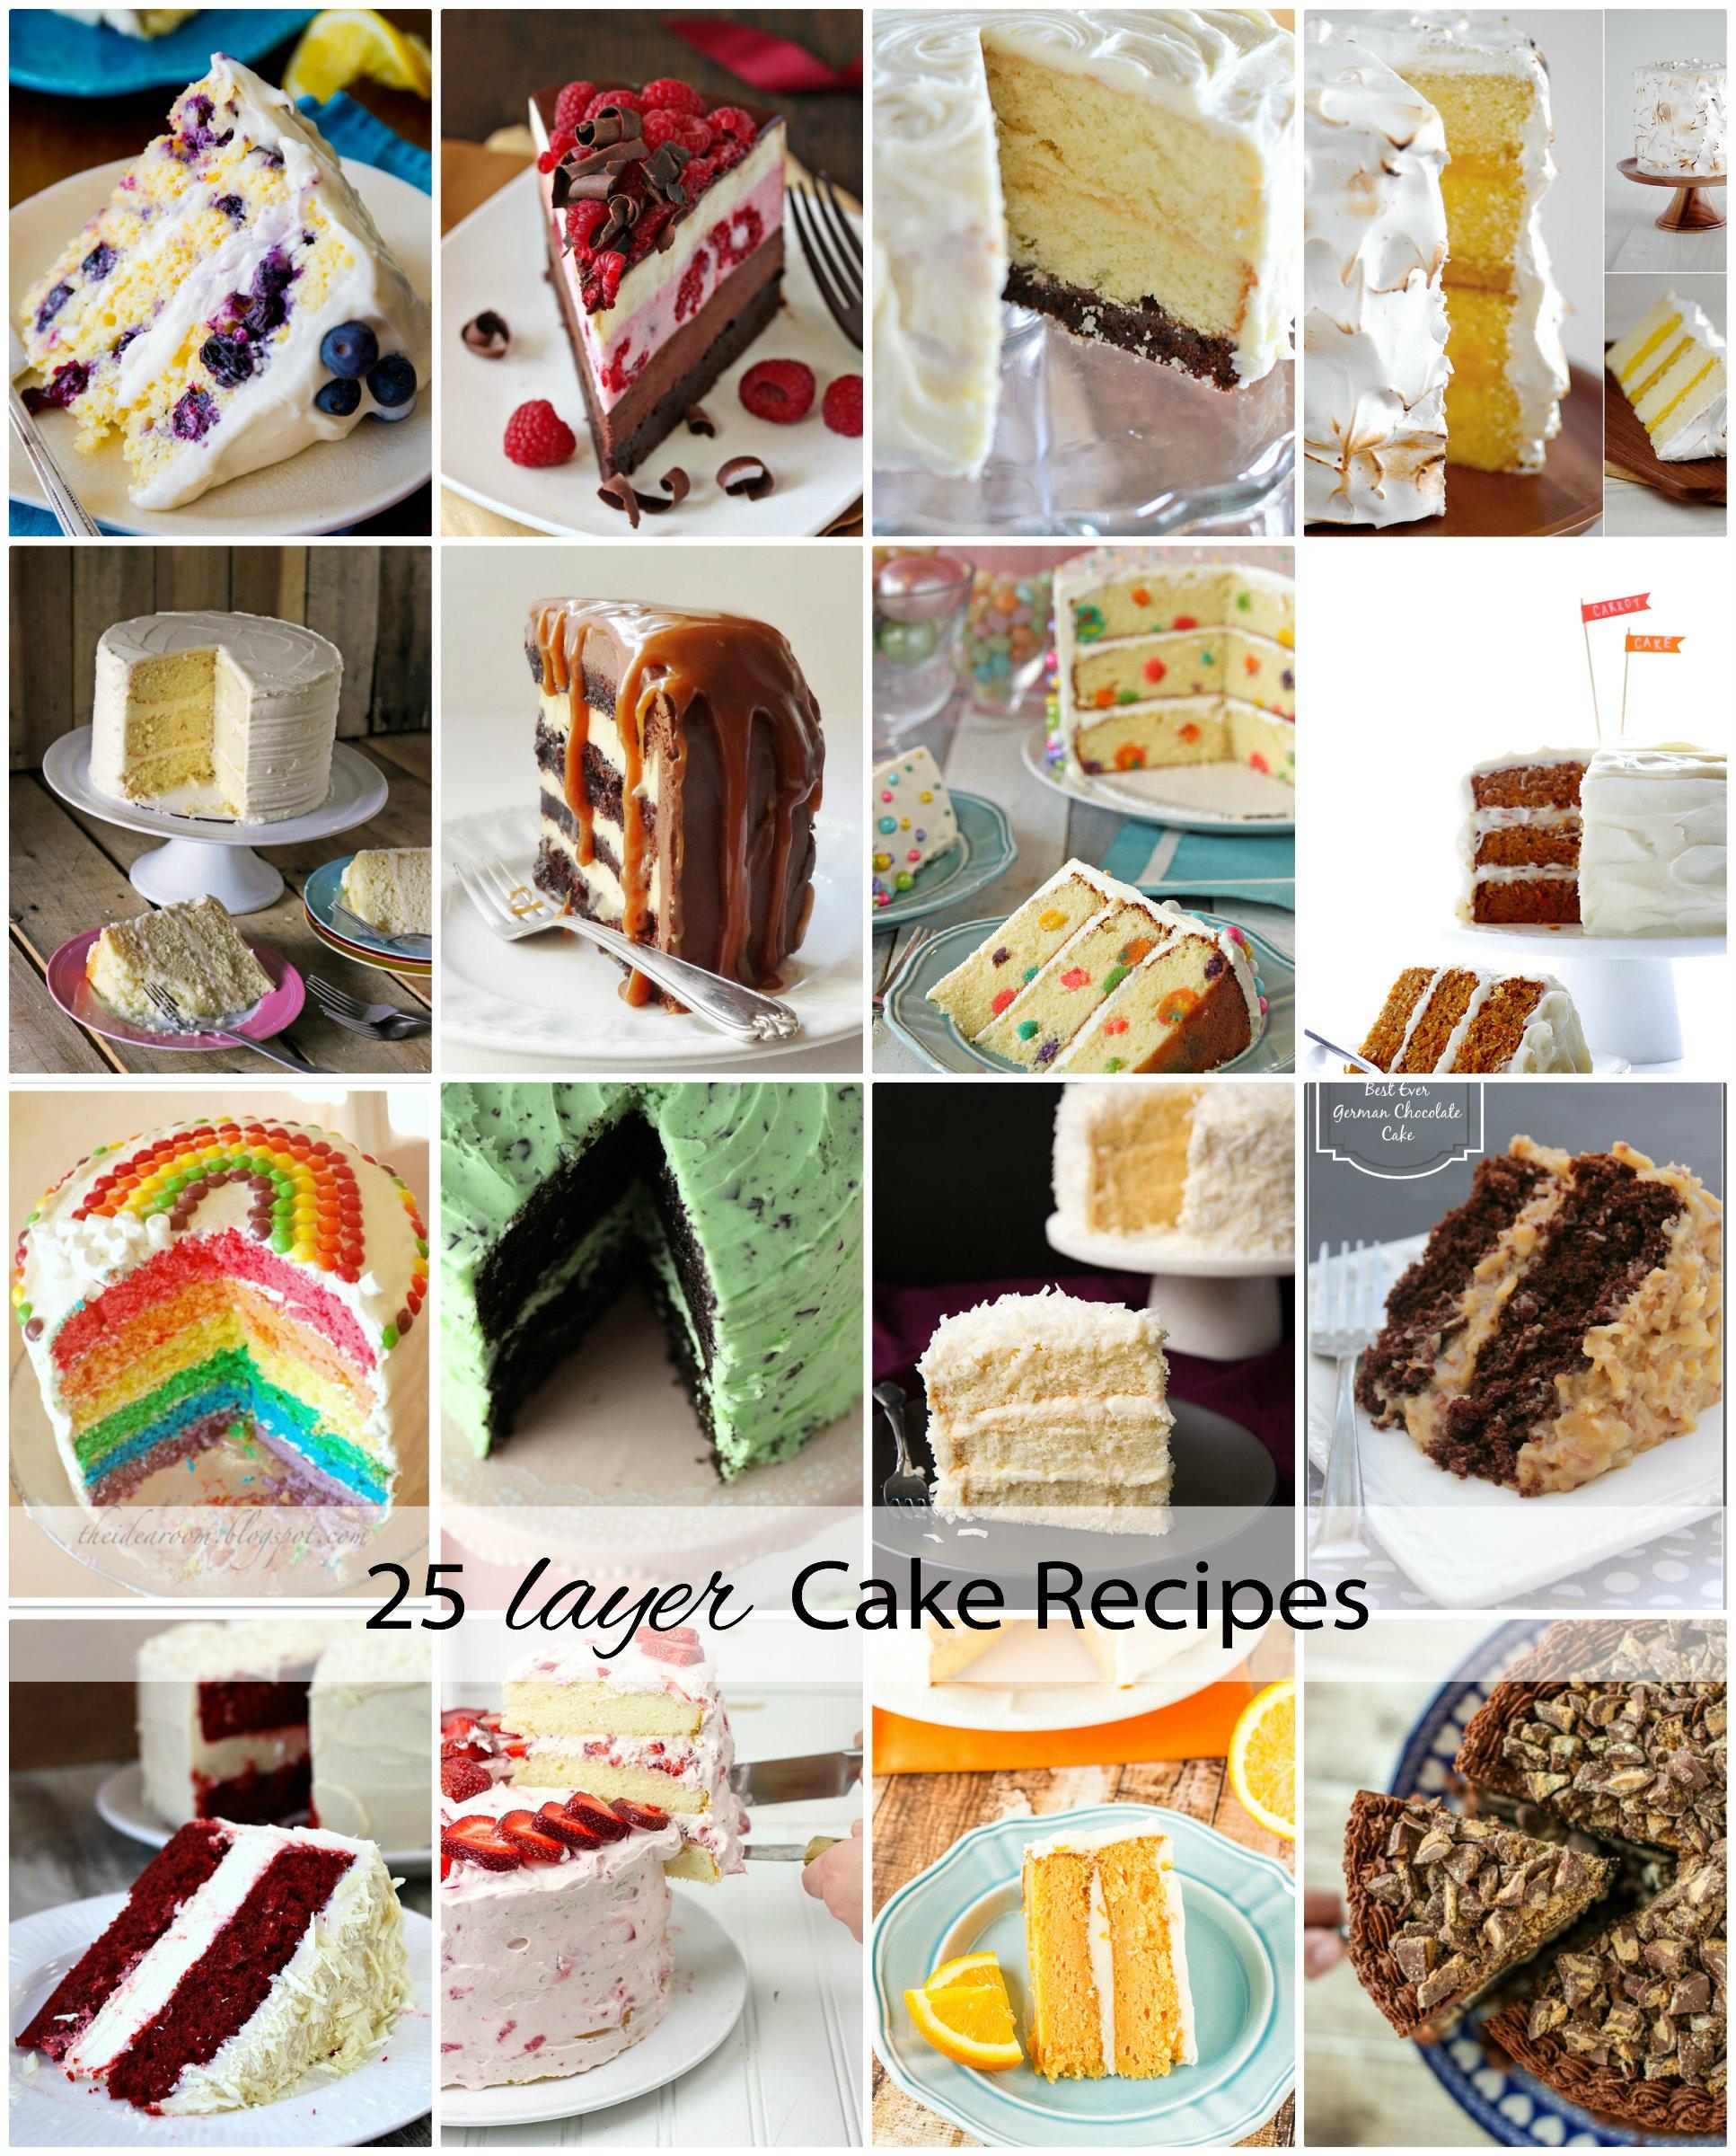 25 Layer Cake Recipes Cover